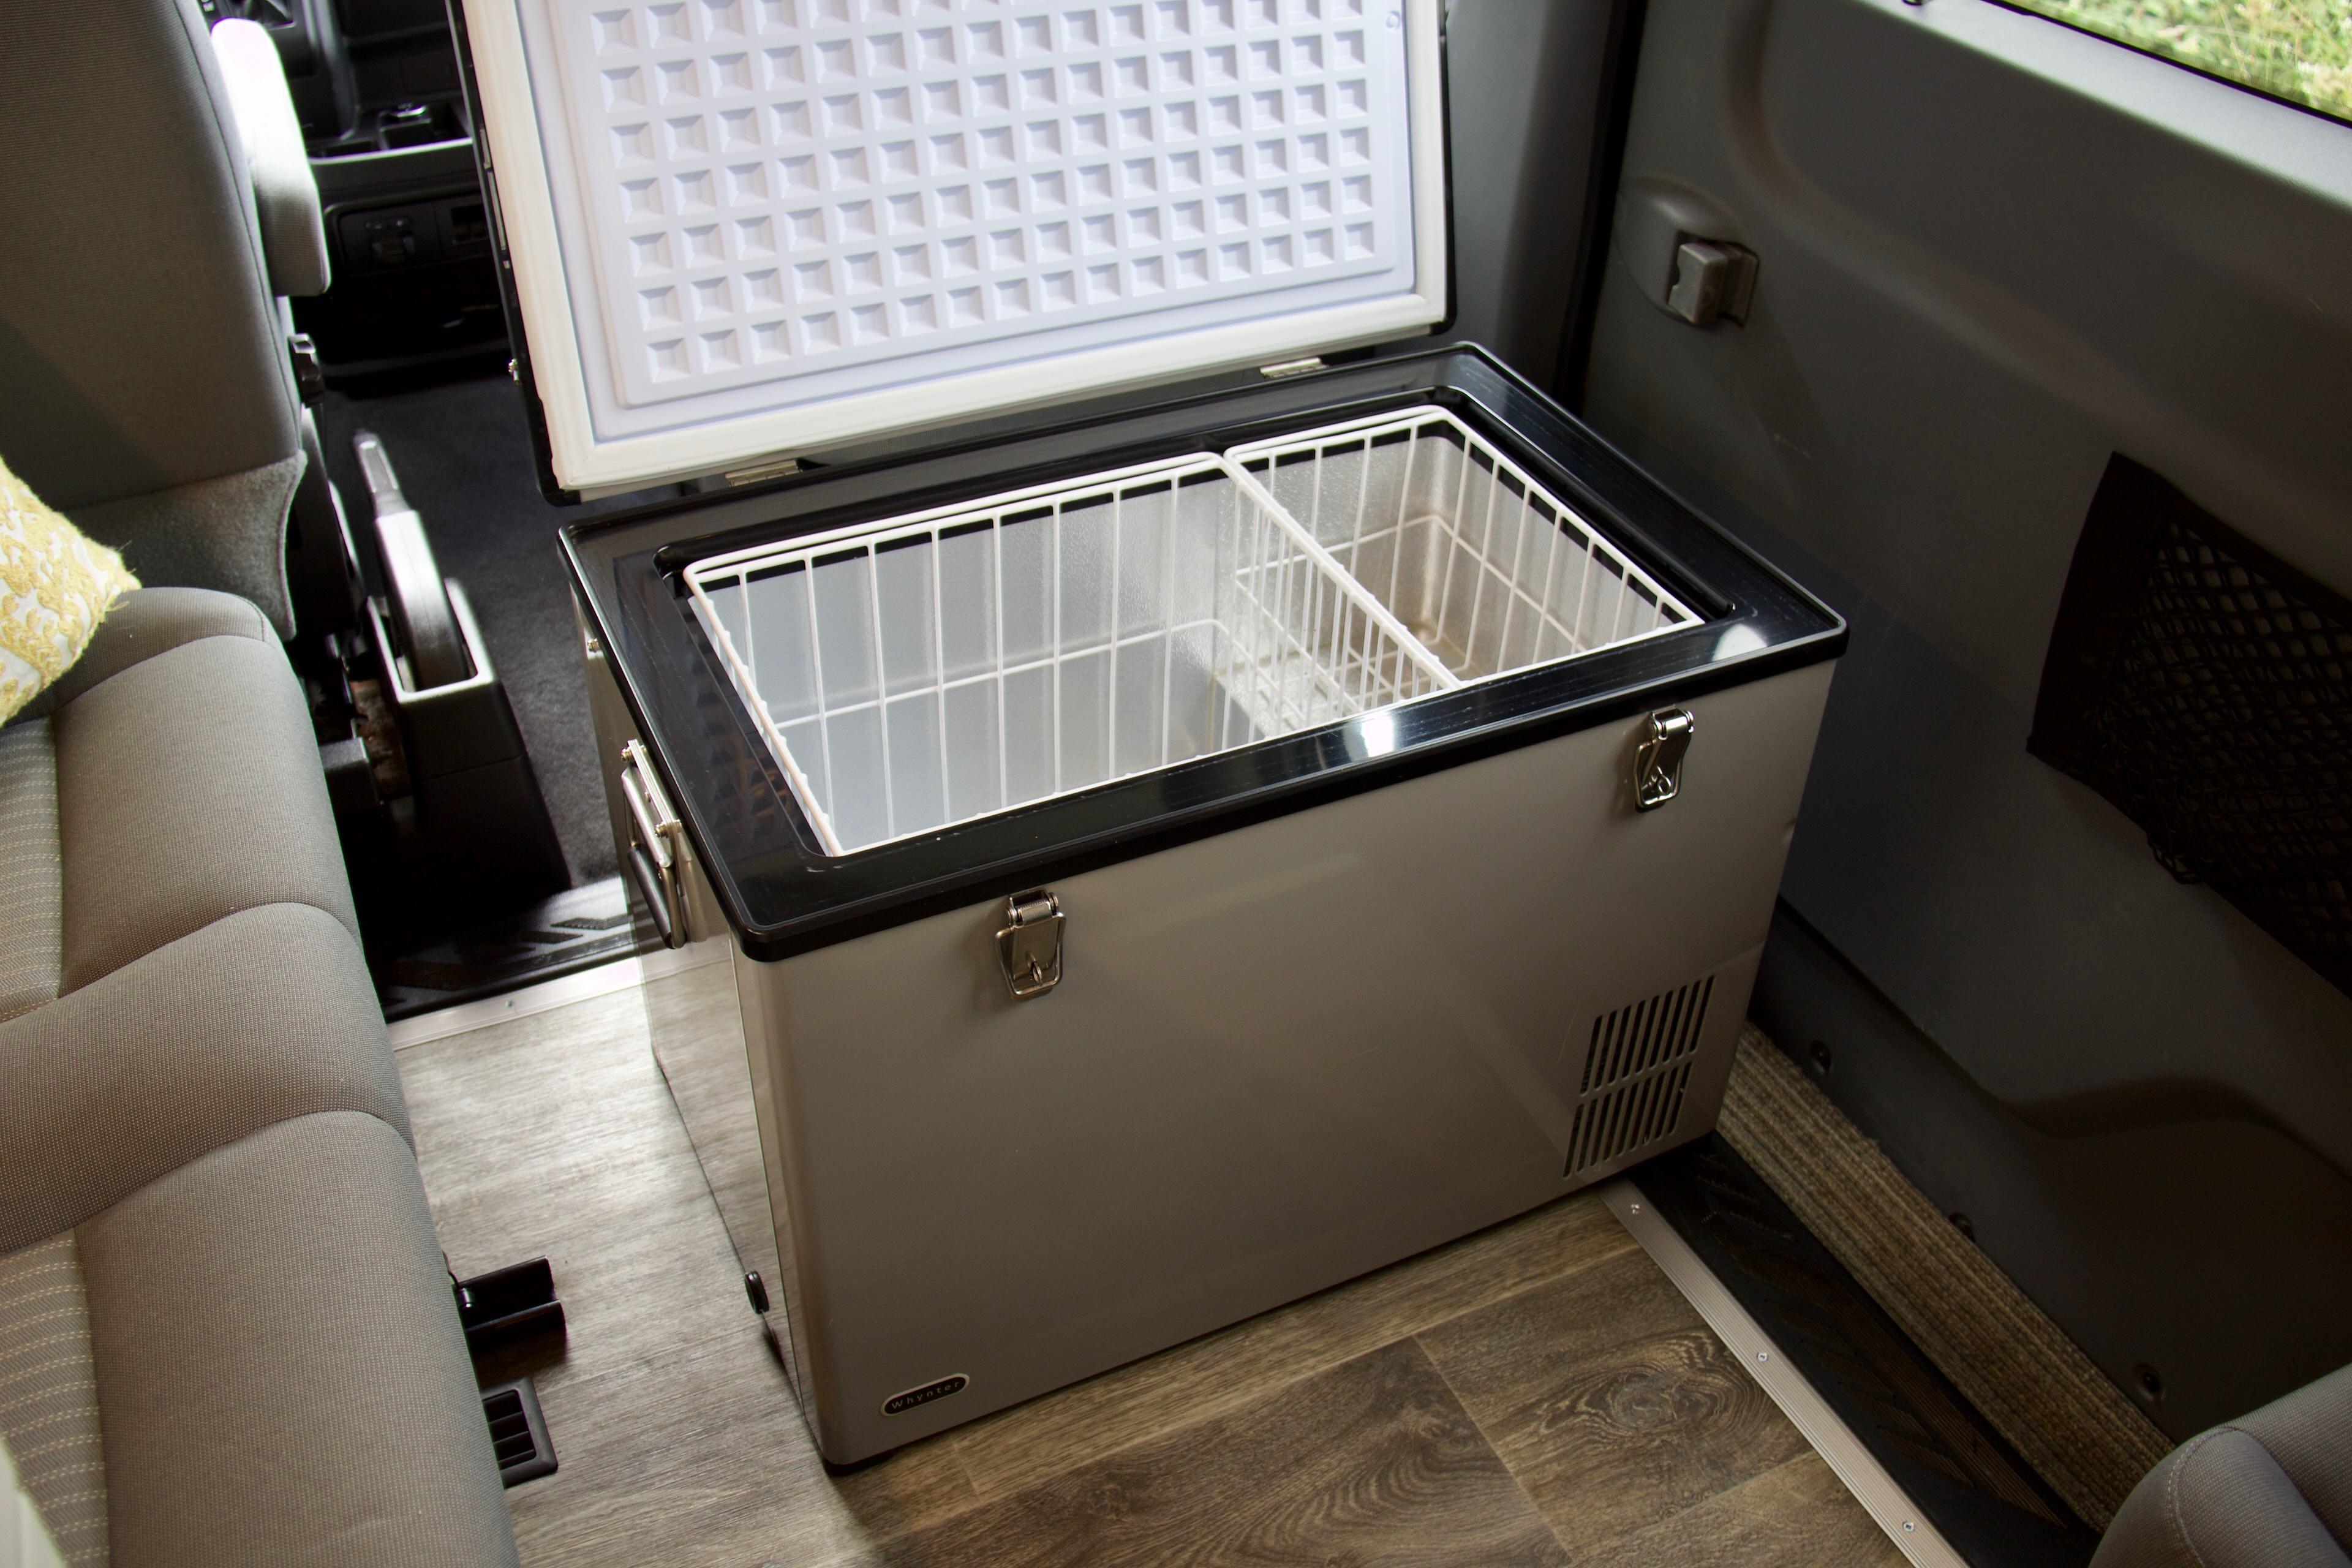 Whynter 12 volt/110 volt 65 quart cooler